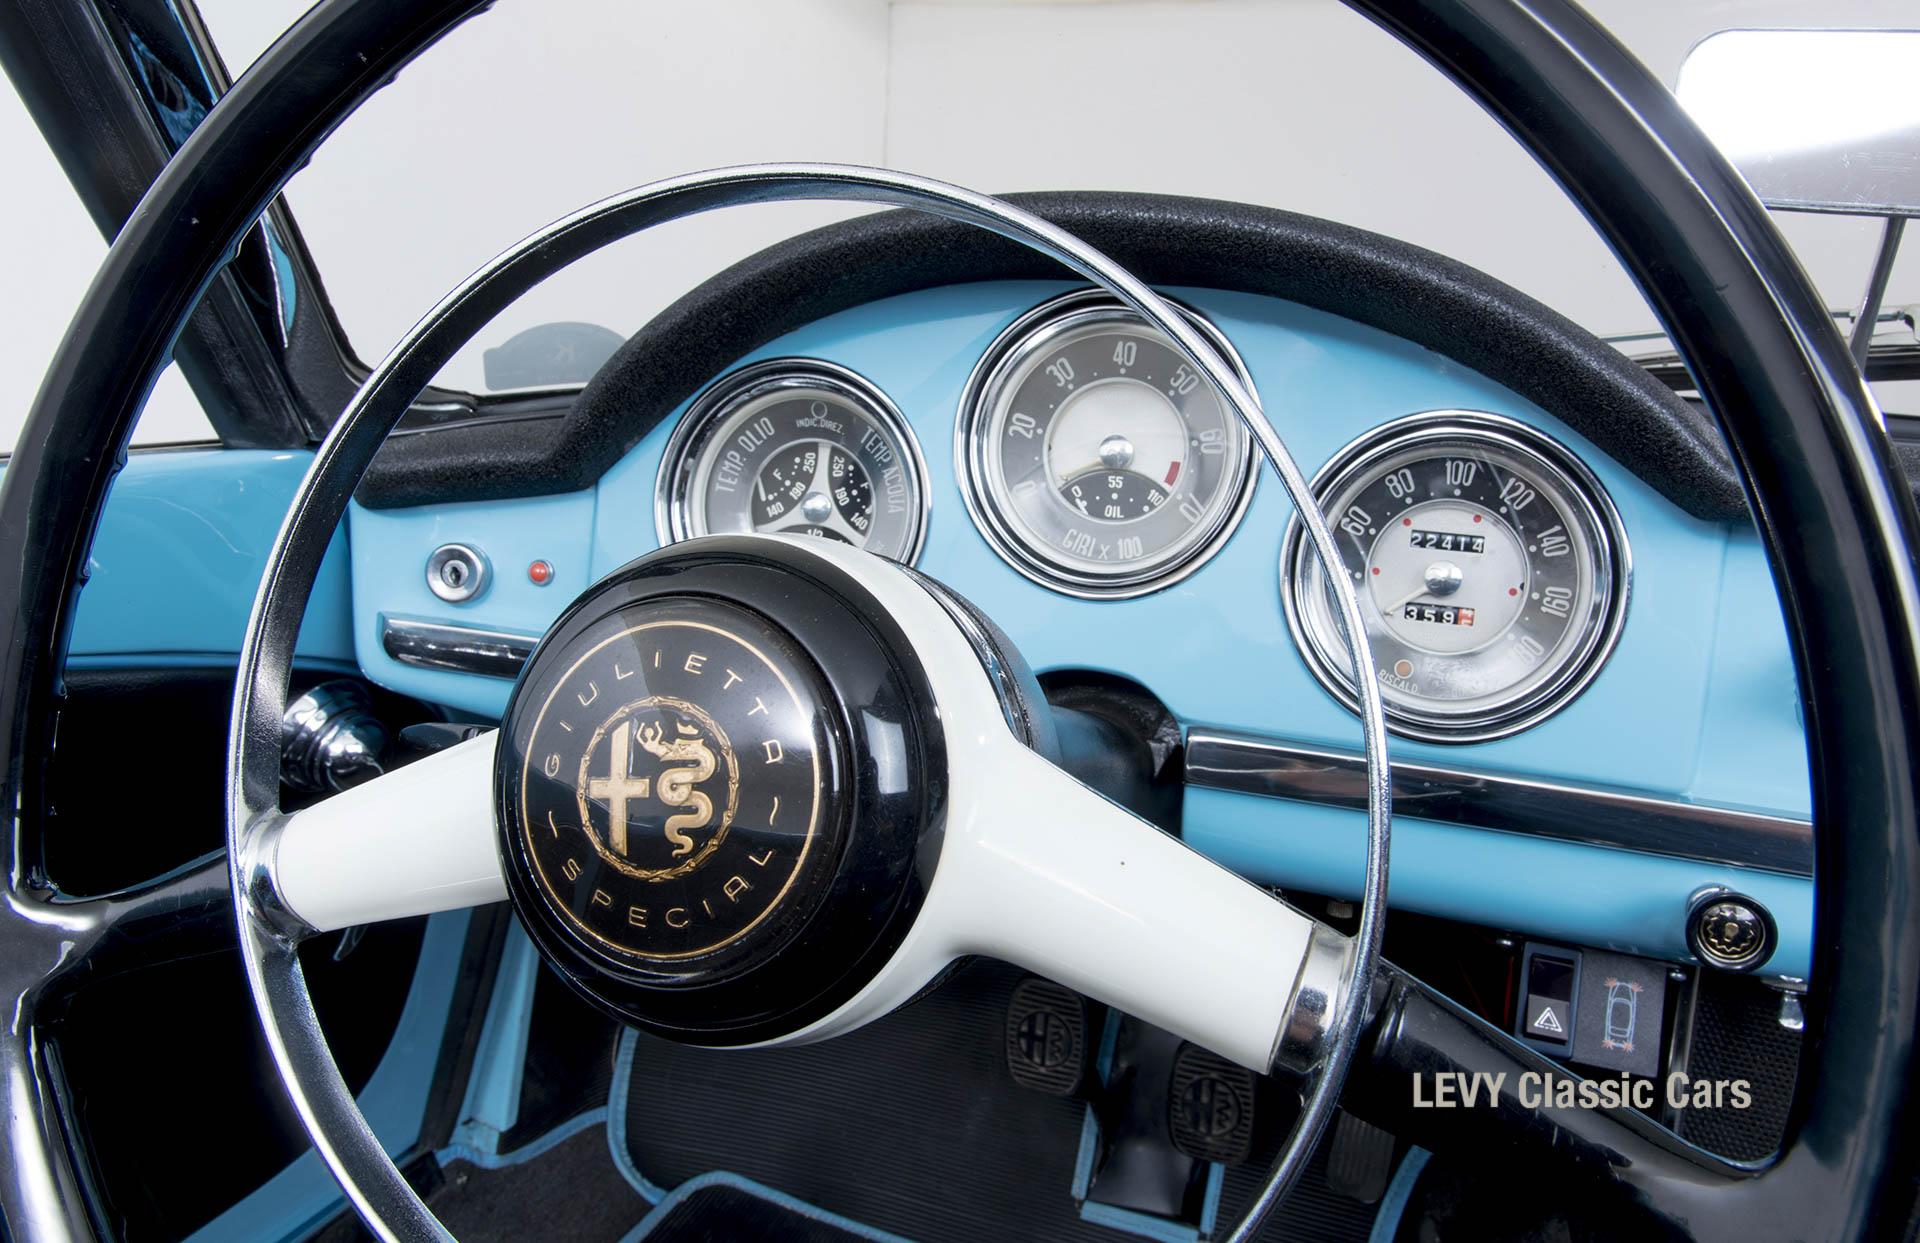 Alfa blau AR14950259 40